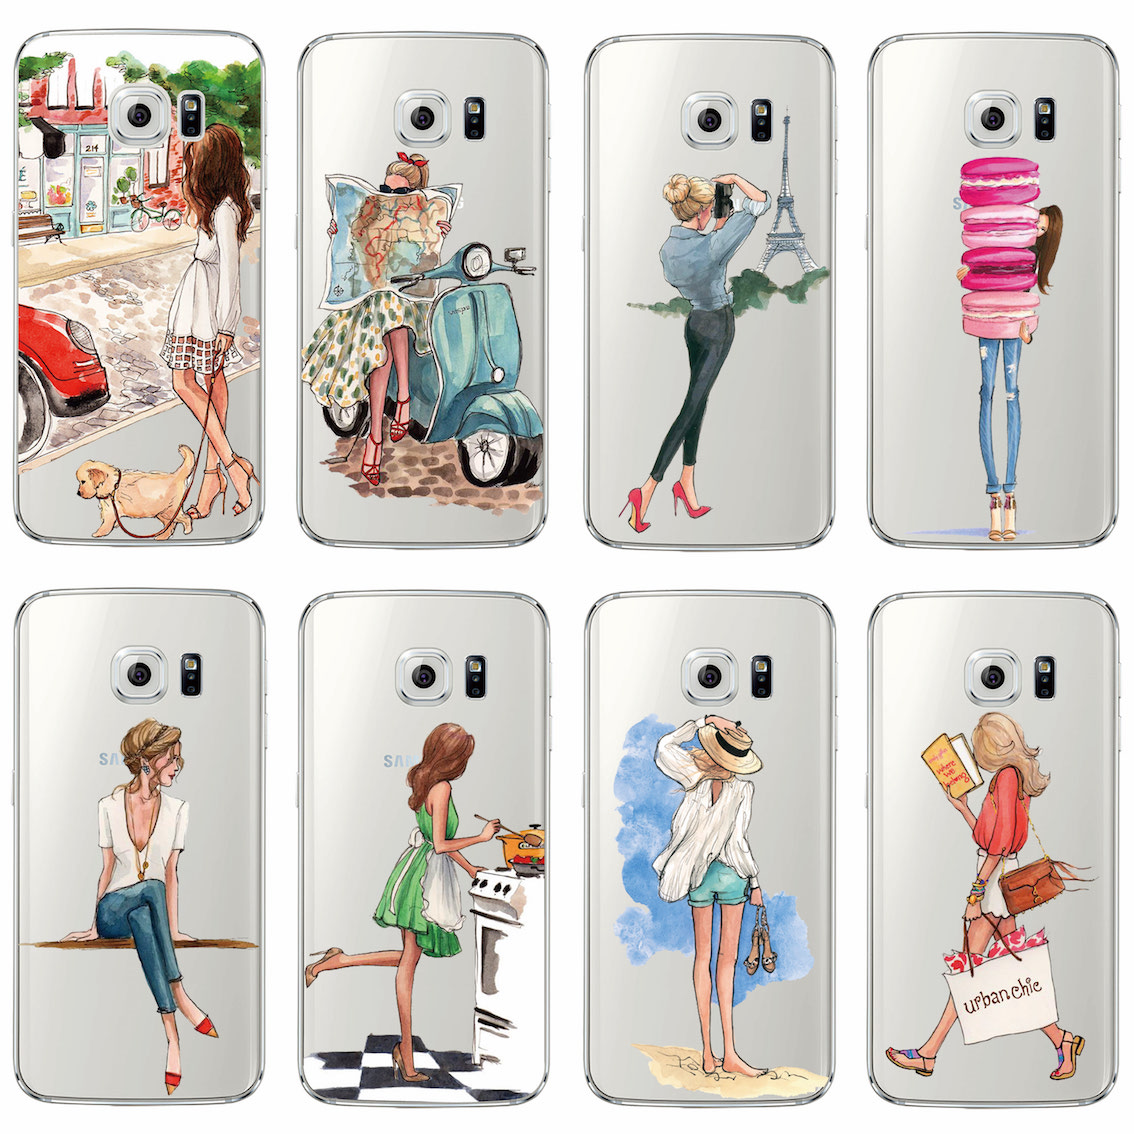 fashion classy paris girl summer legs travel relax beach. Black Bedroom Furniture Sets. Home Design Ideas